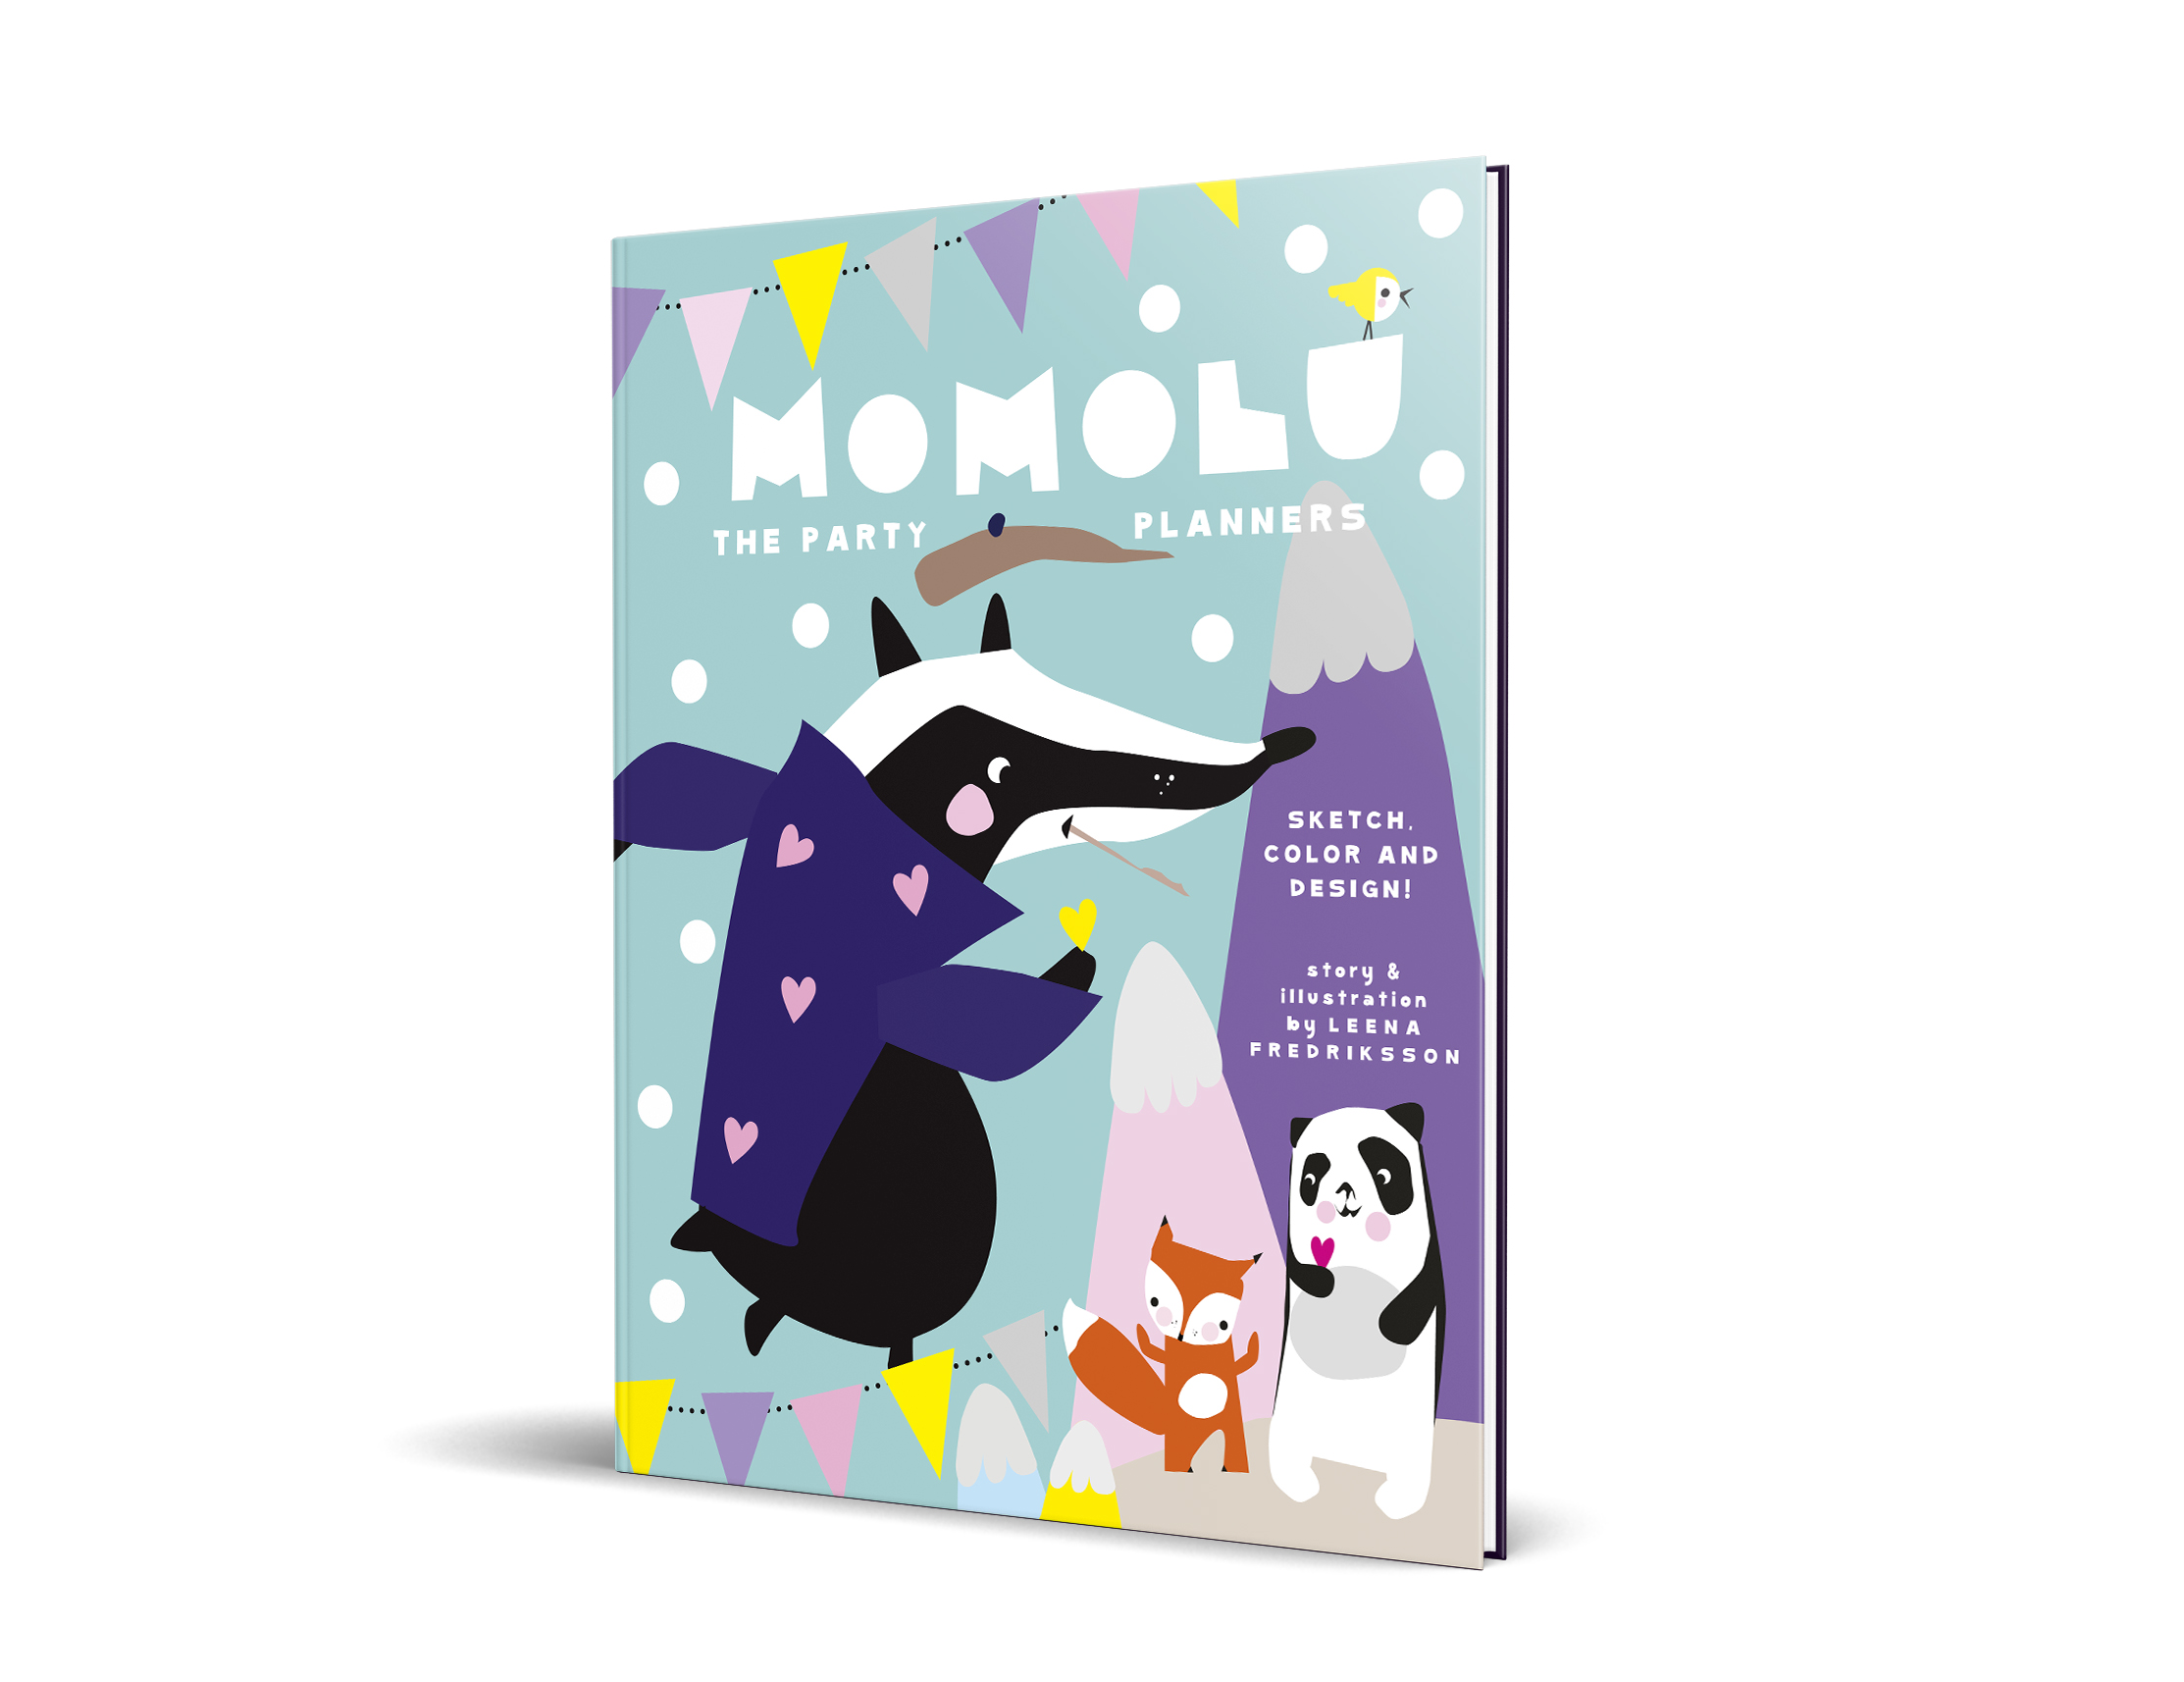 MOMOLU_partyplanners_COVERBOOKsmall2.jpg